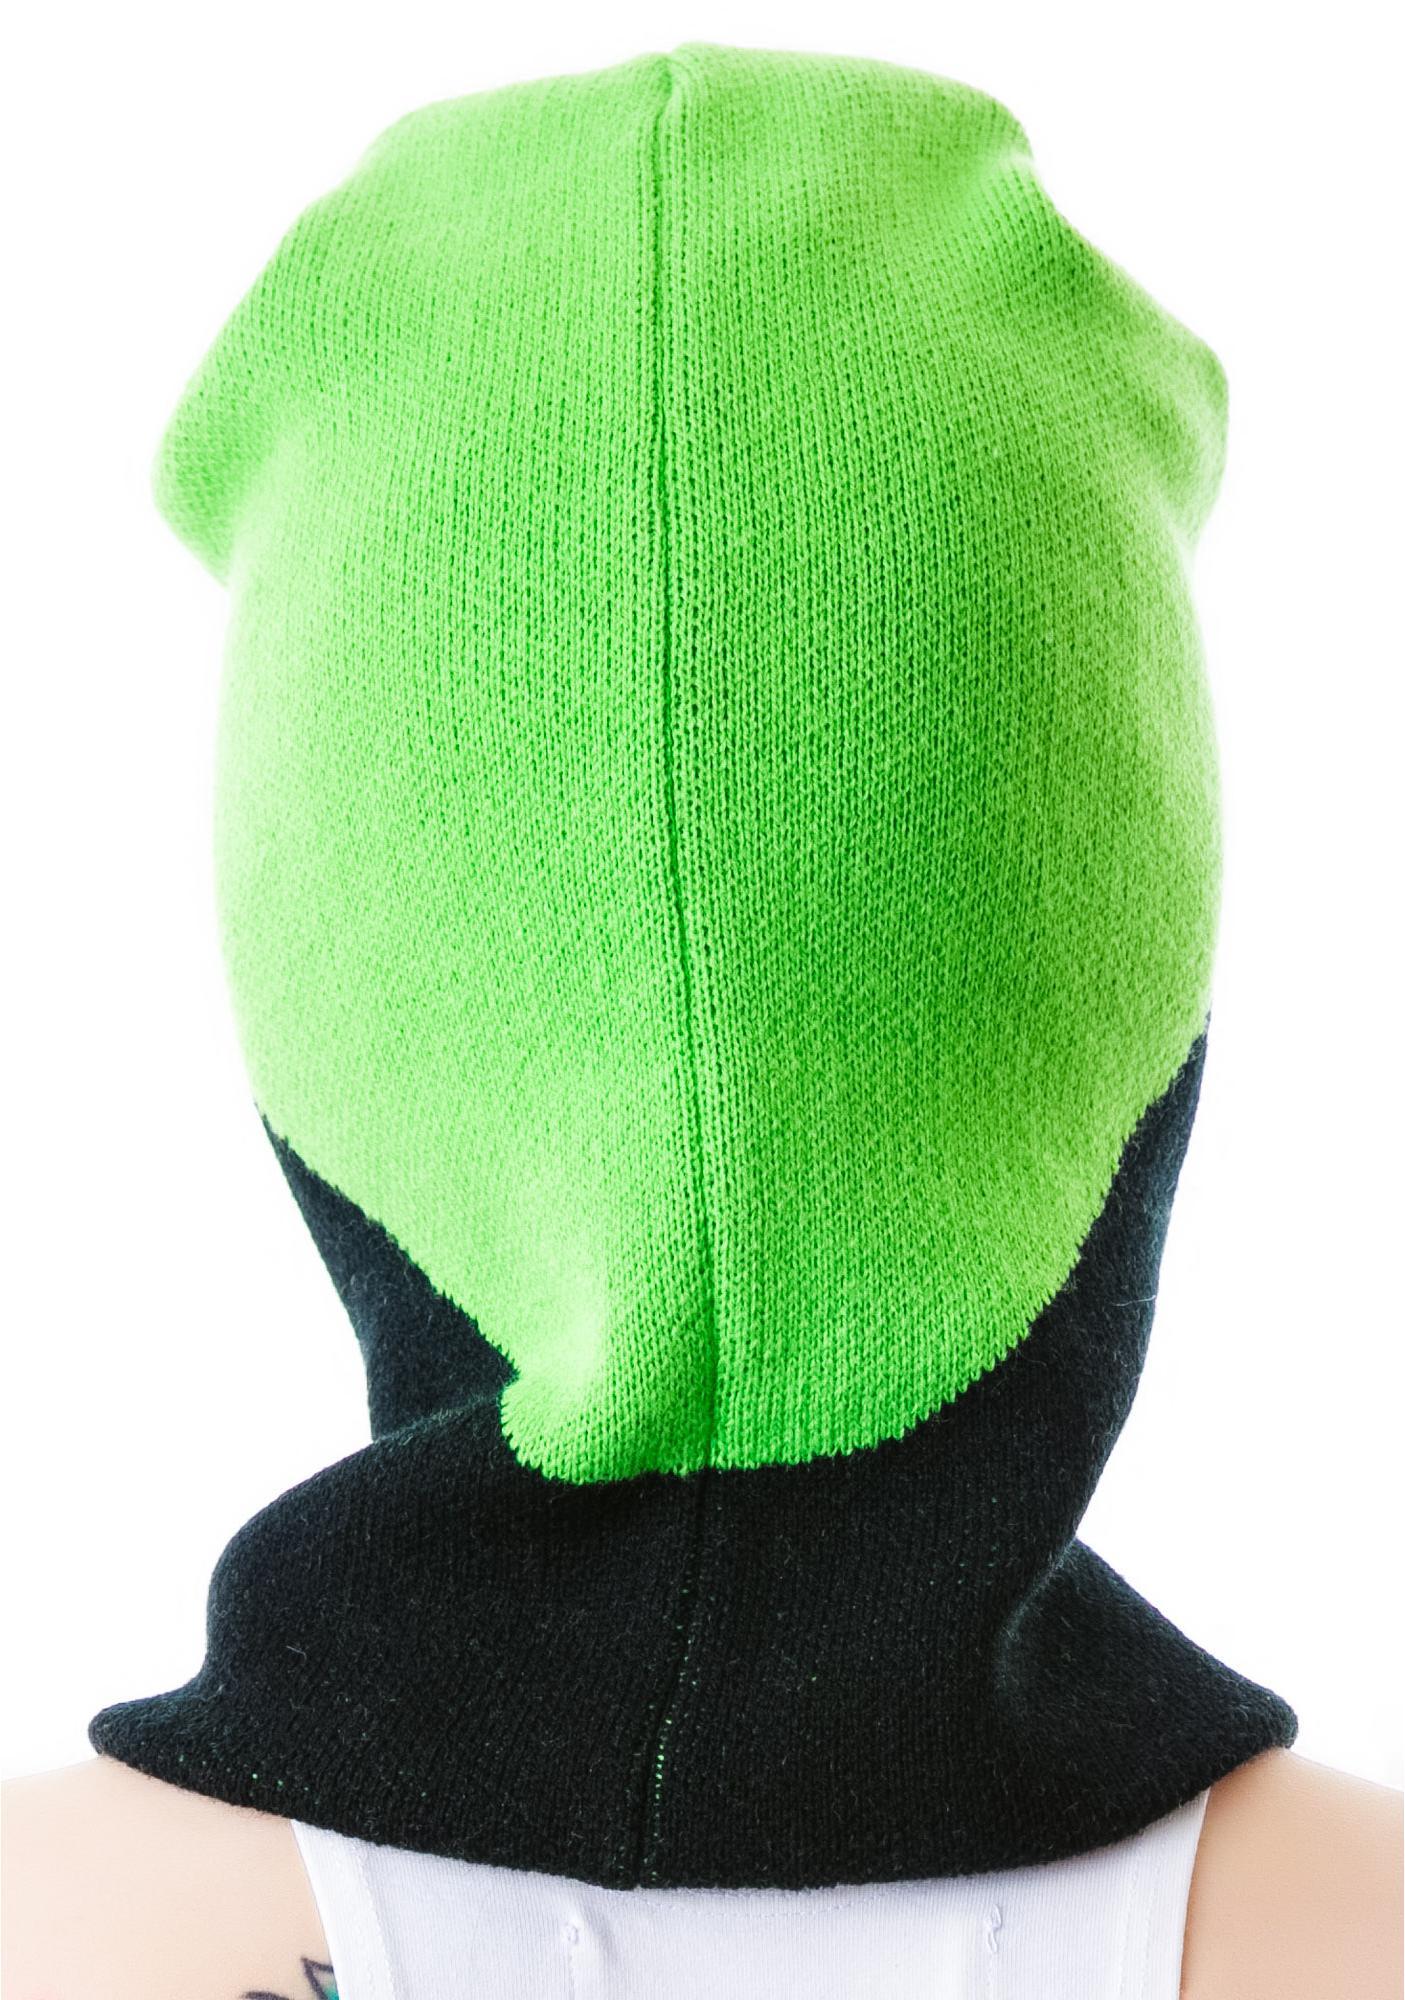 Alien Invasion Knit Mask